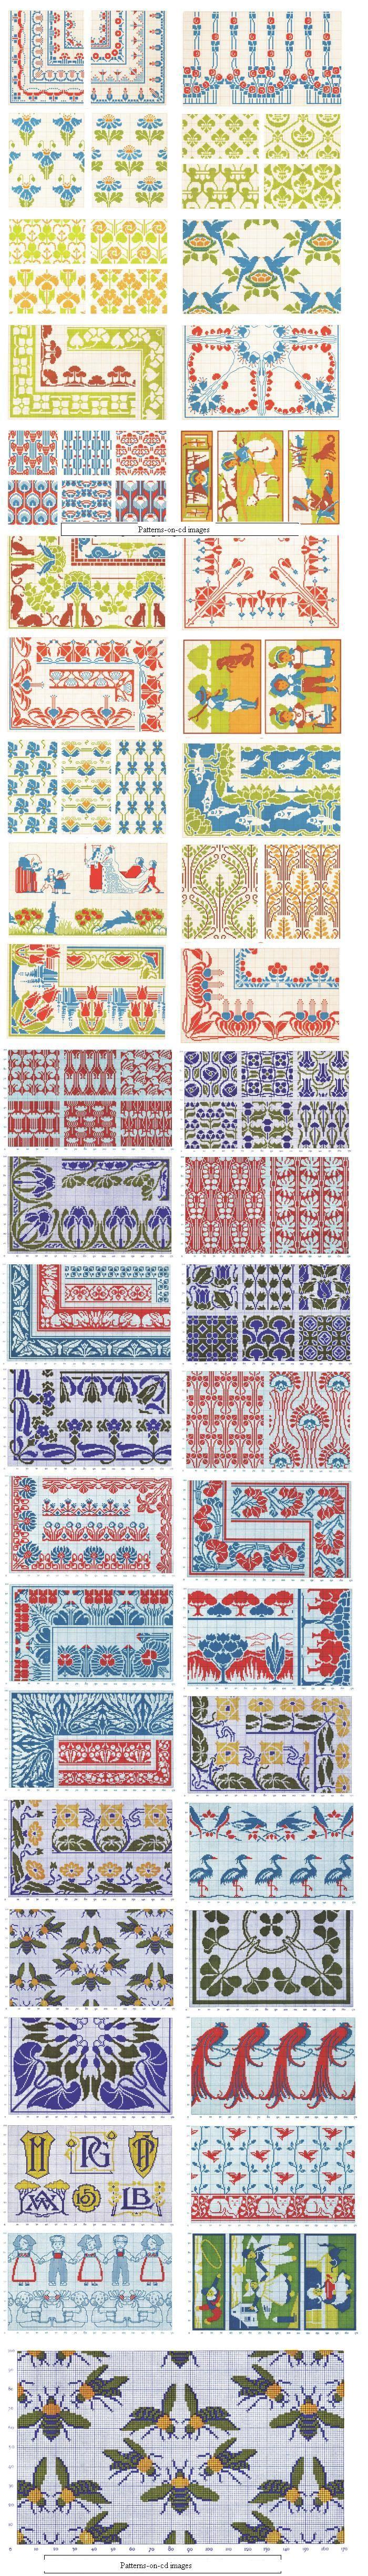 44 Collage Victorian DMC Cross Stitch Charts Pattern CD | eBay